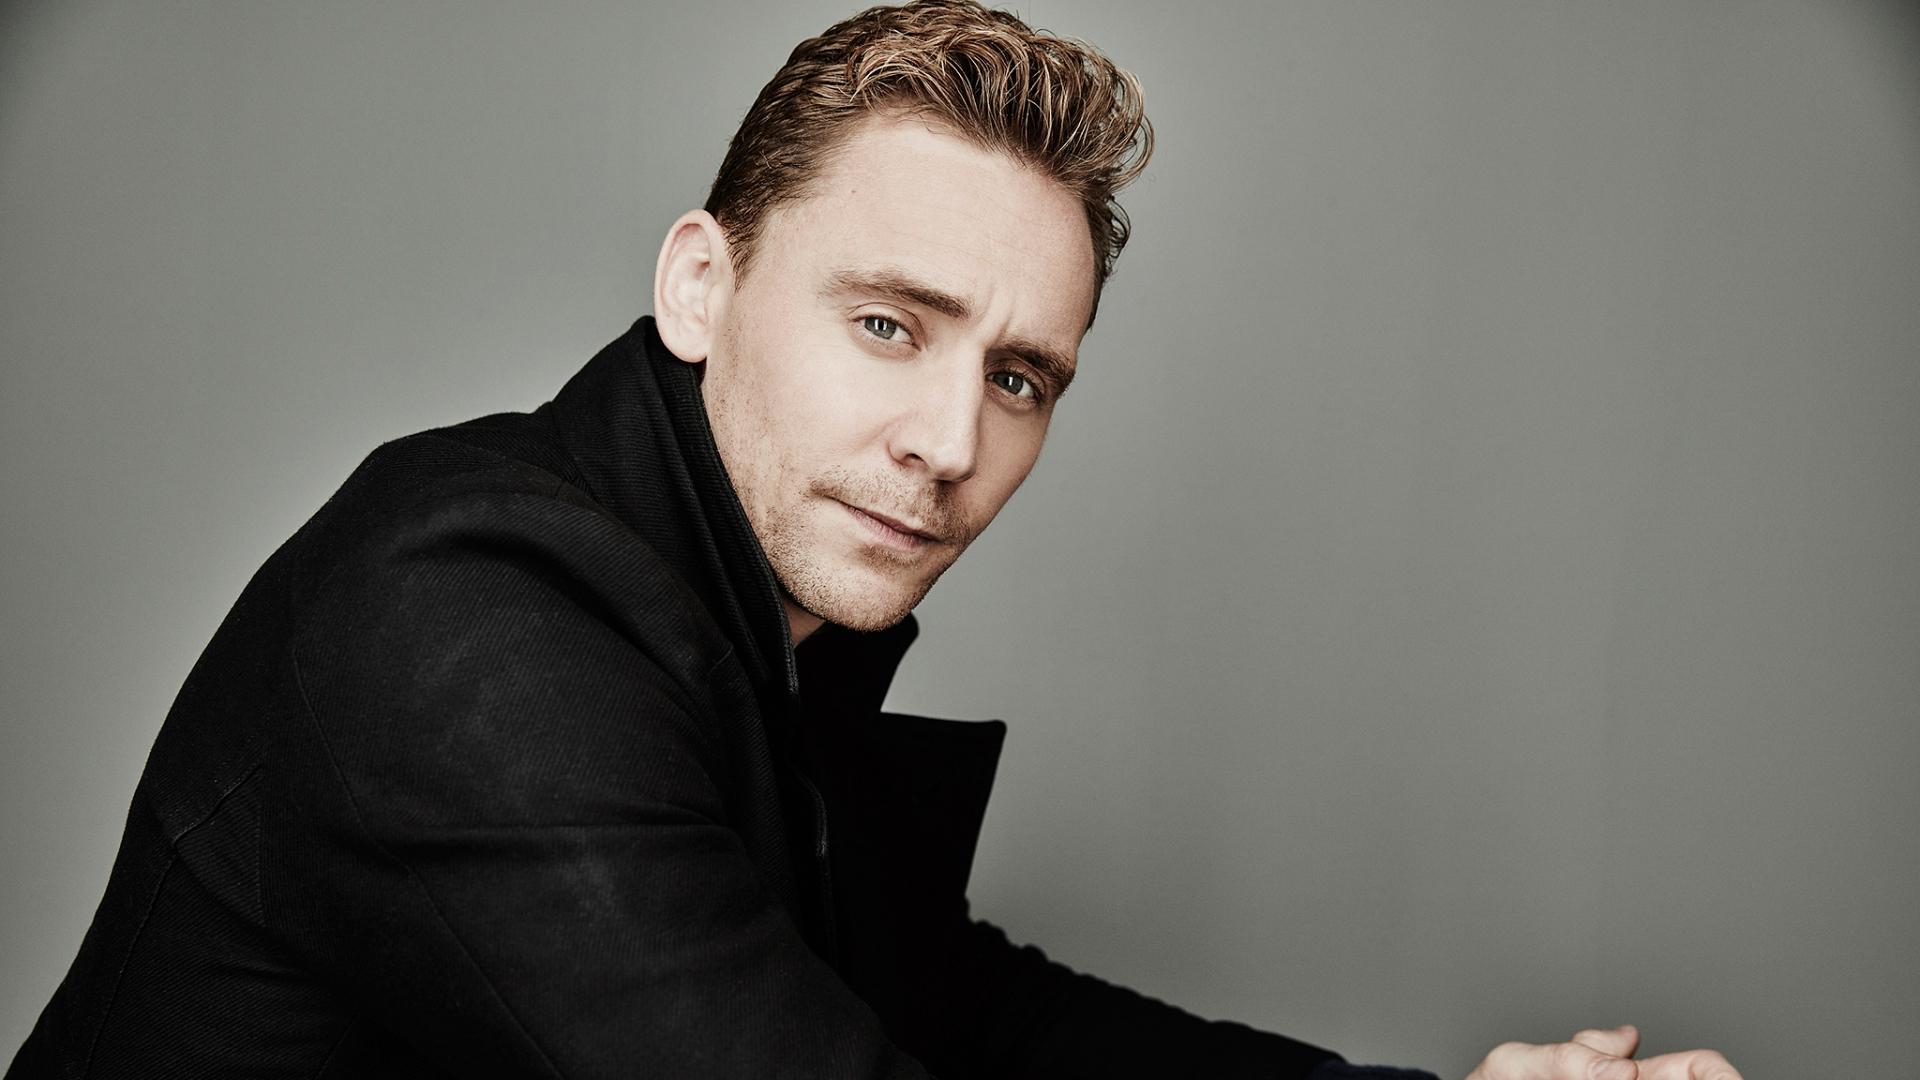 Tom Hiddleston Computer Wallpaper